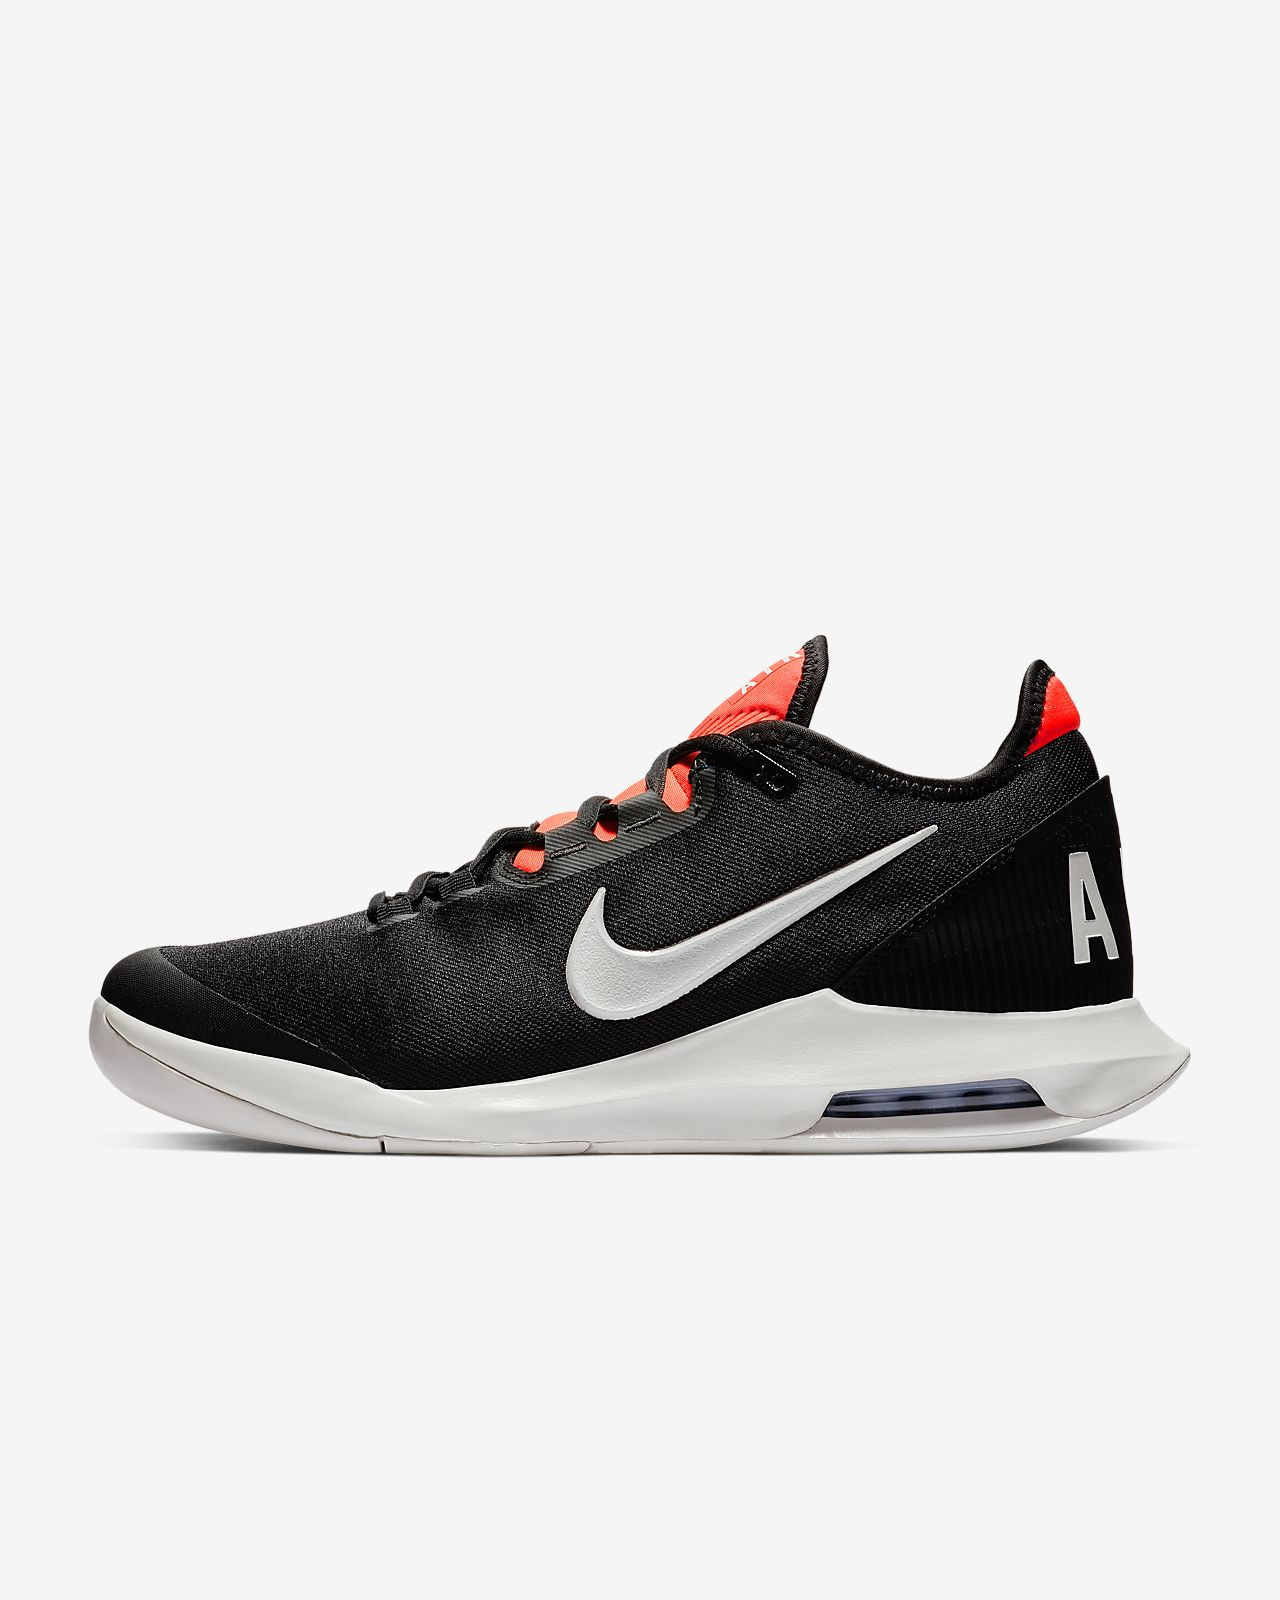 new styles 5e85e 11b24 ... Chaussure de tennis NikeCourt Air Max Wildcard pour Homme